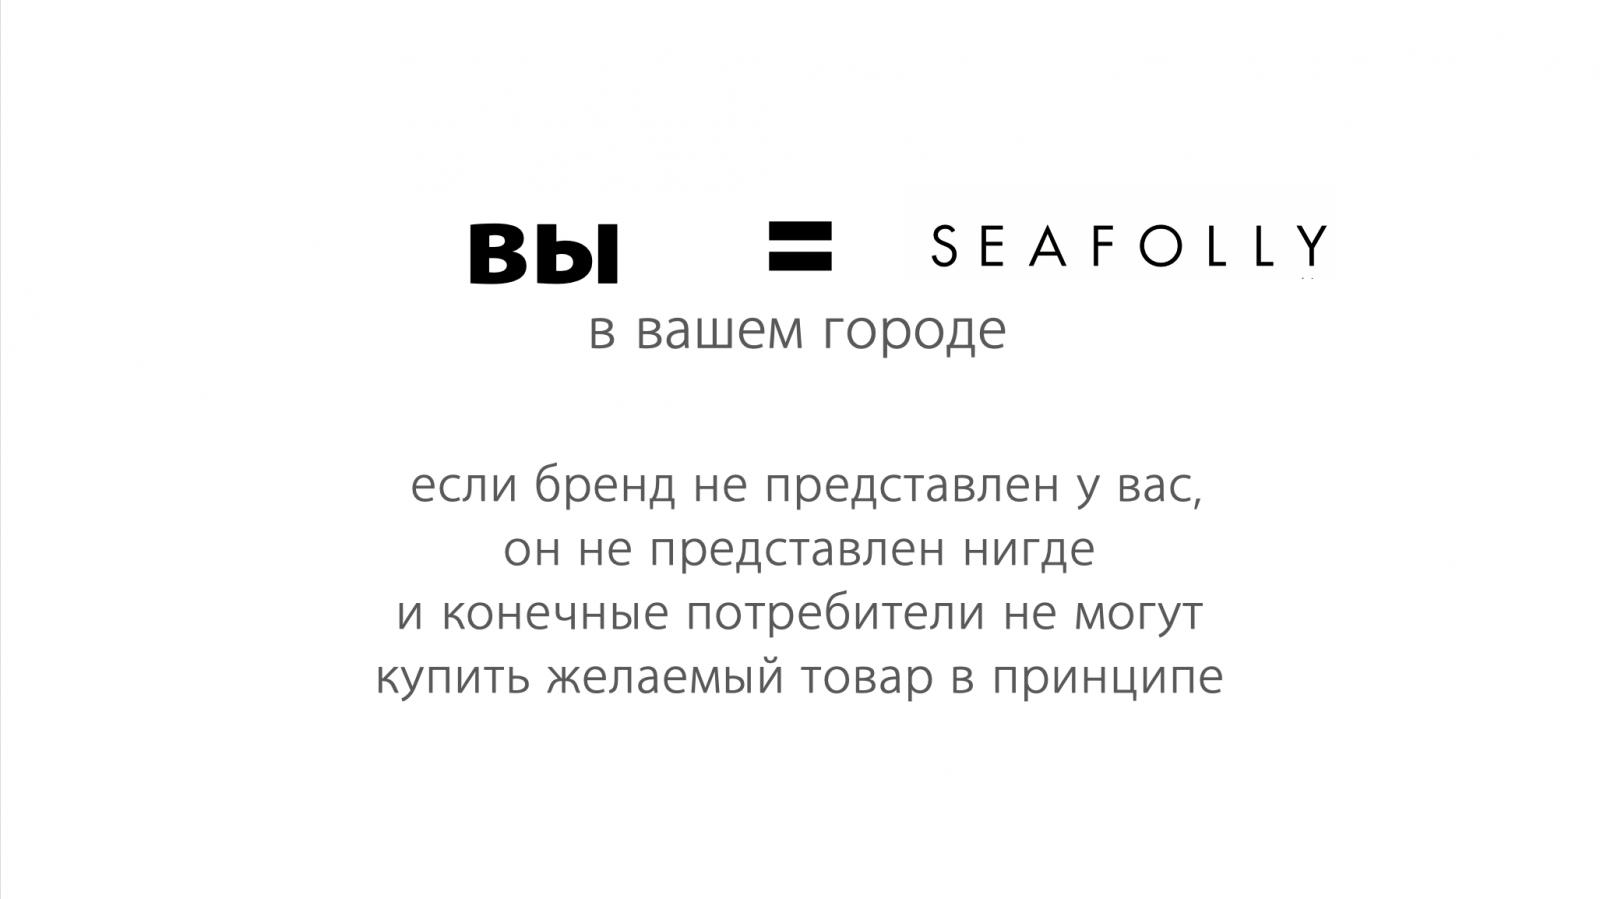 SF42 SEAFOLLY